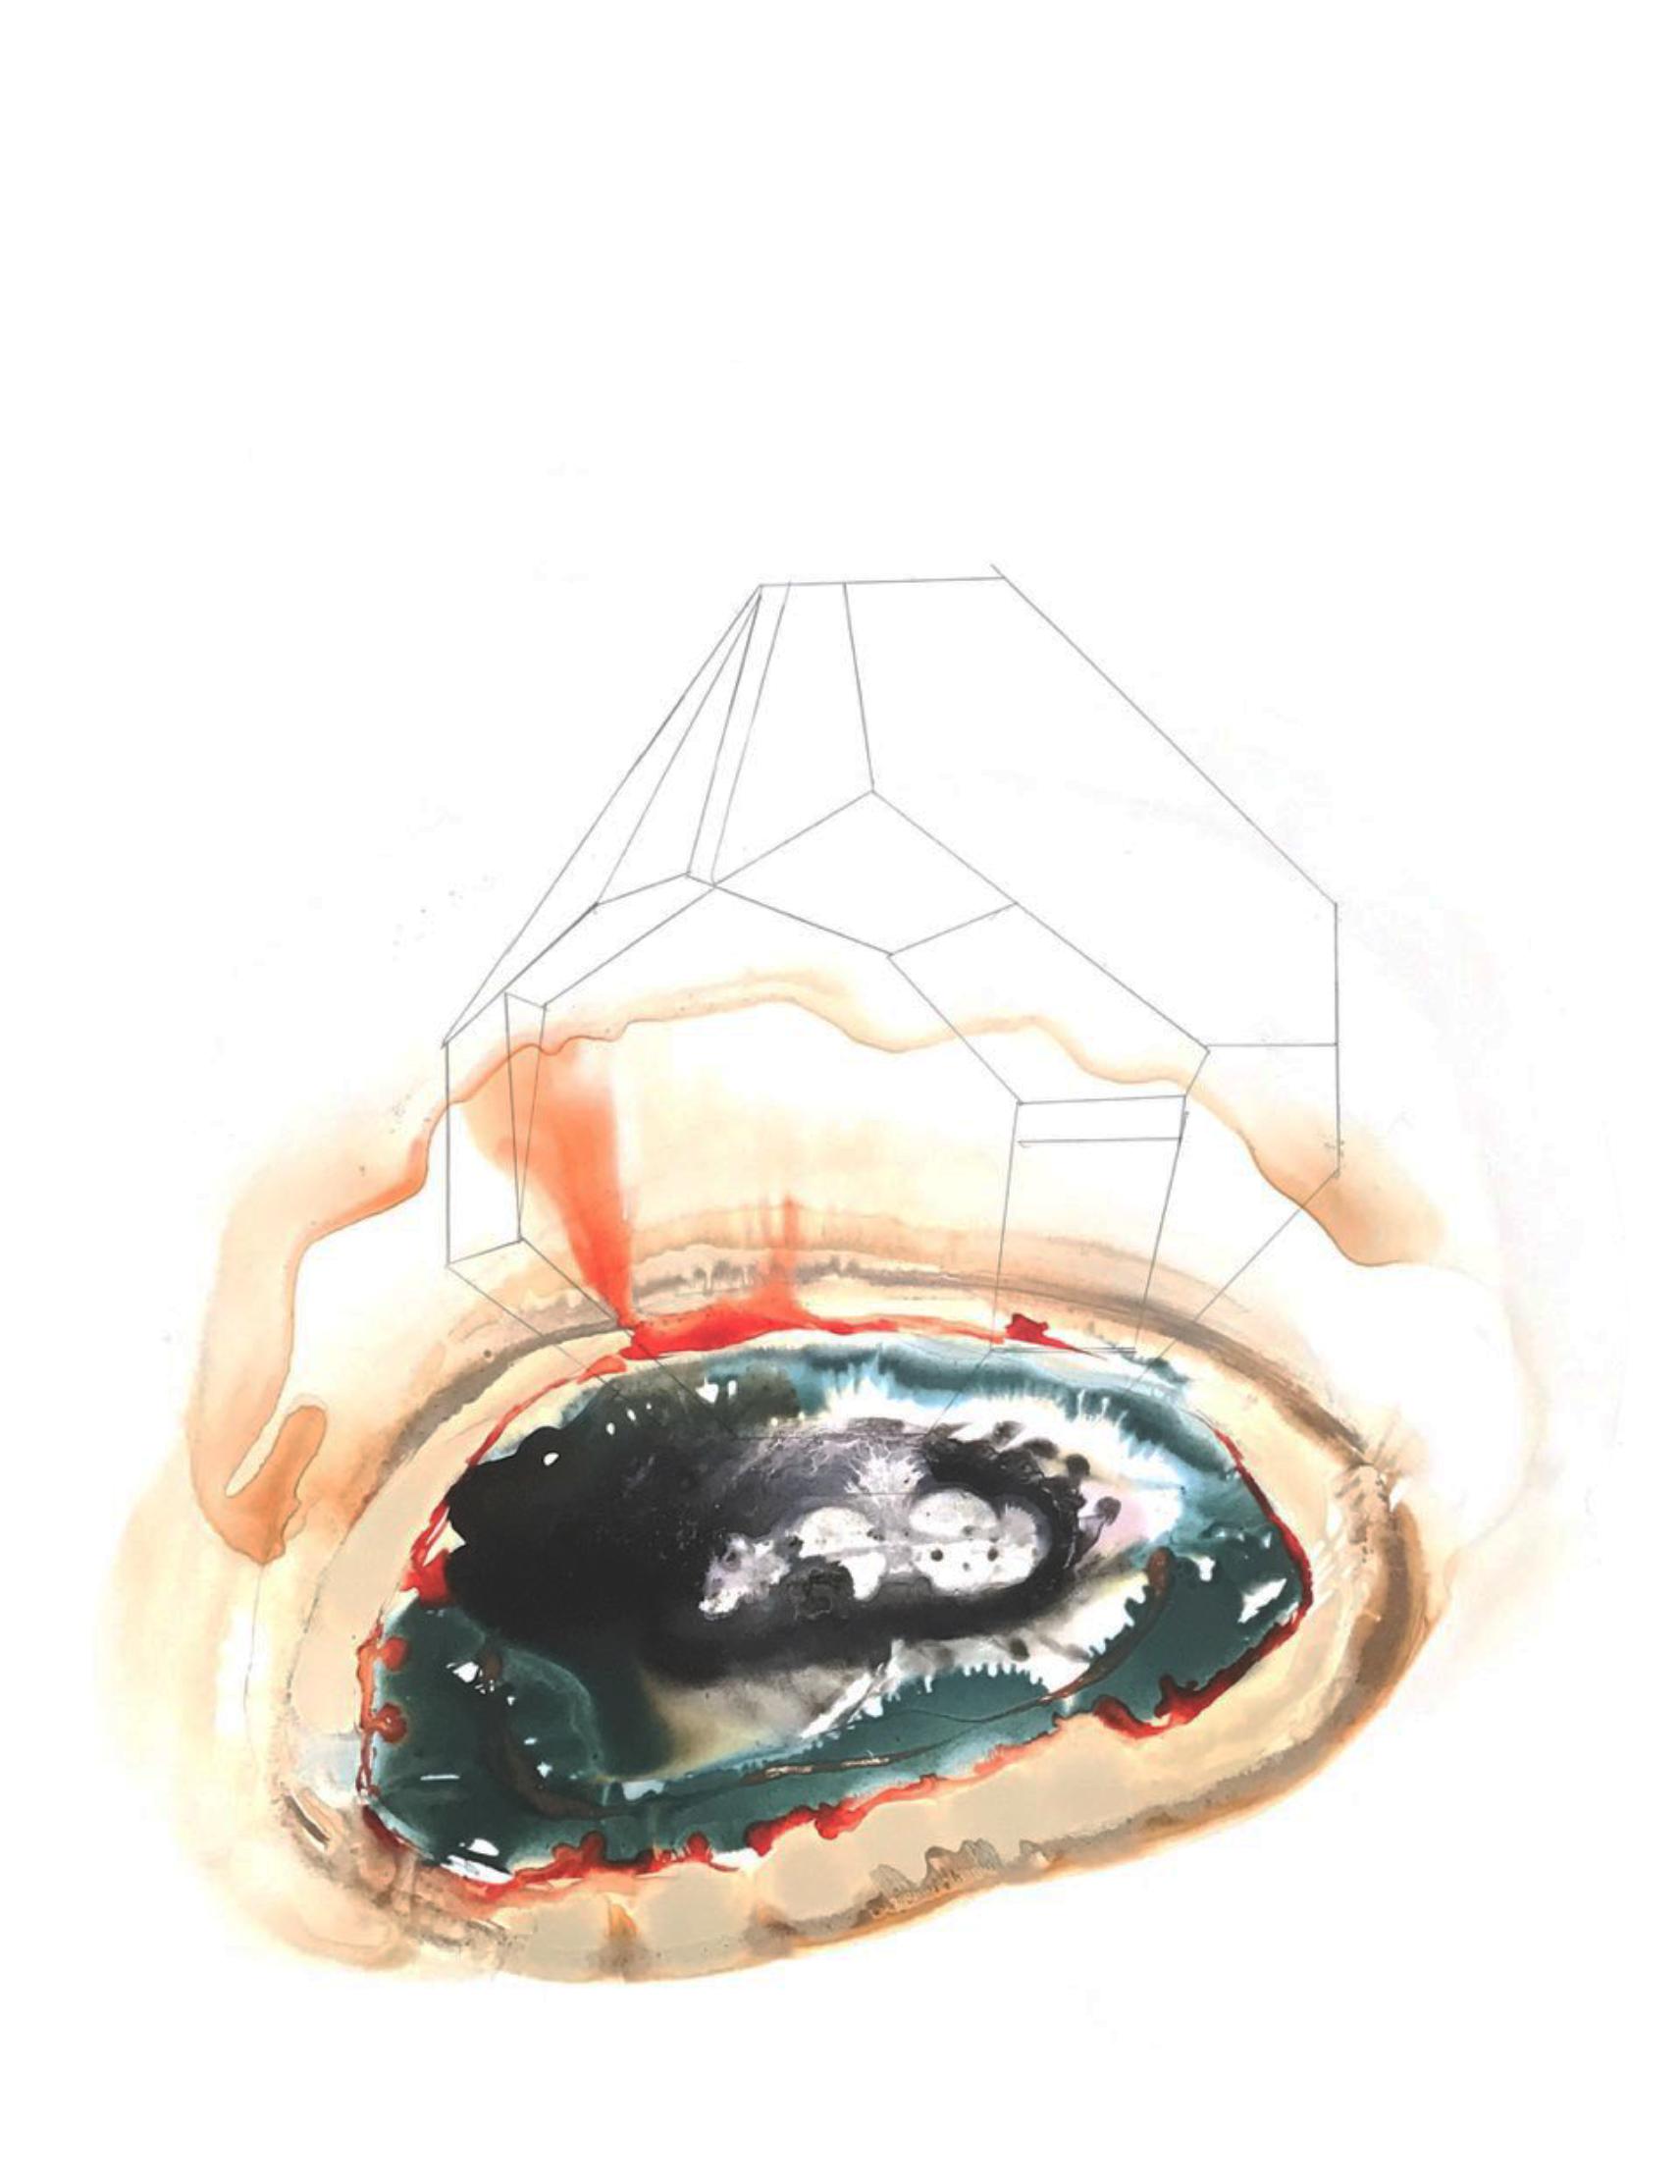 agate, crystals, gemstones17.png